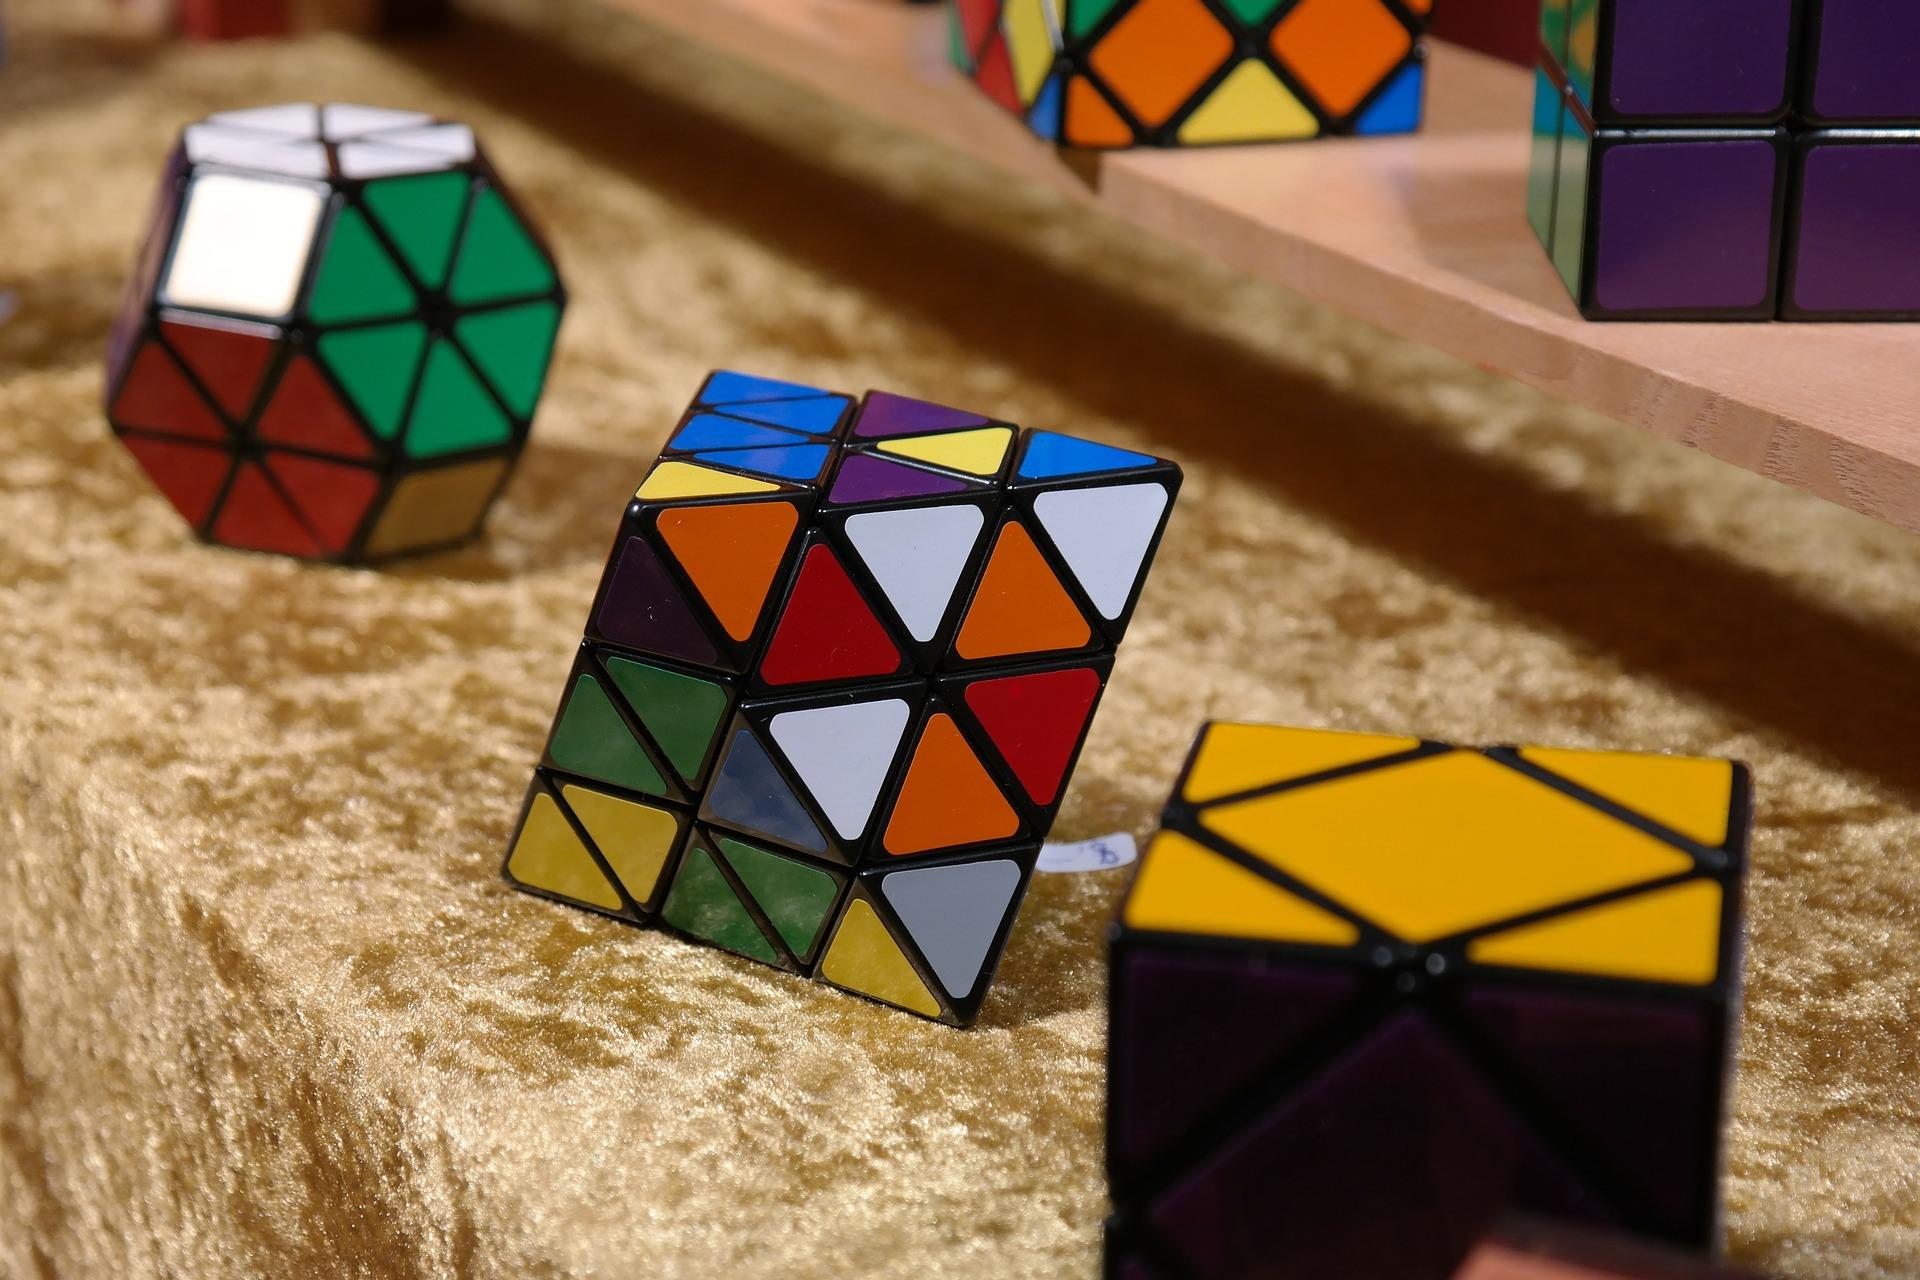 Cubos de rubik con diferentes niveles de dificultad